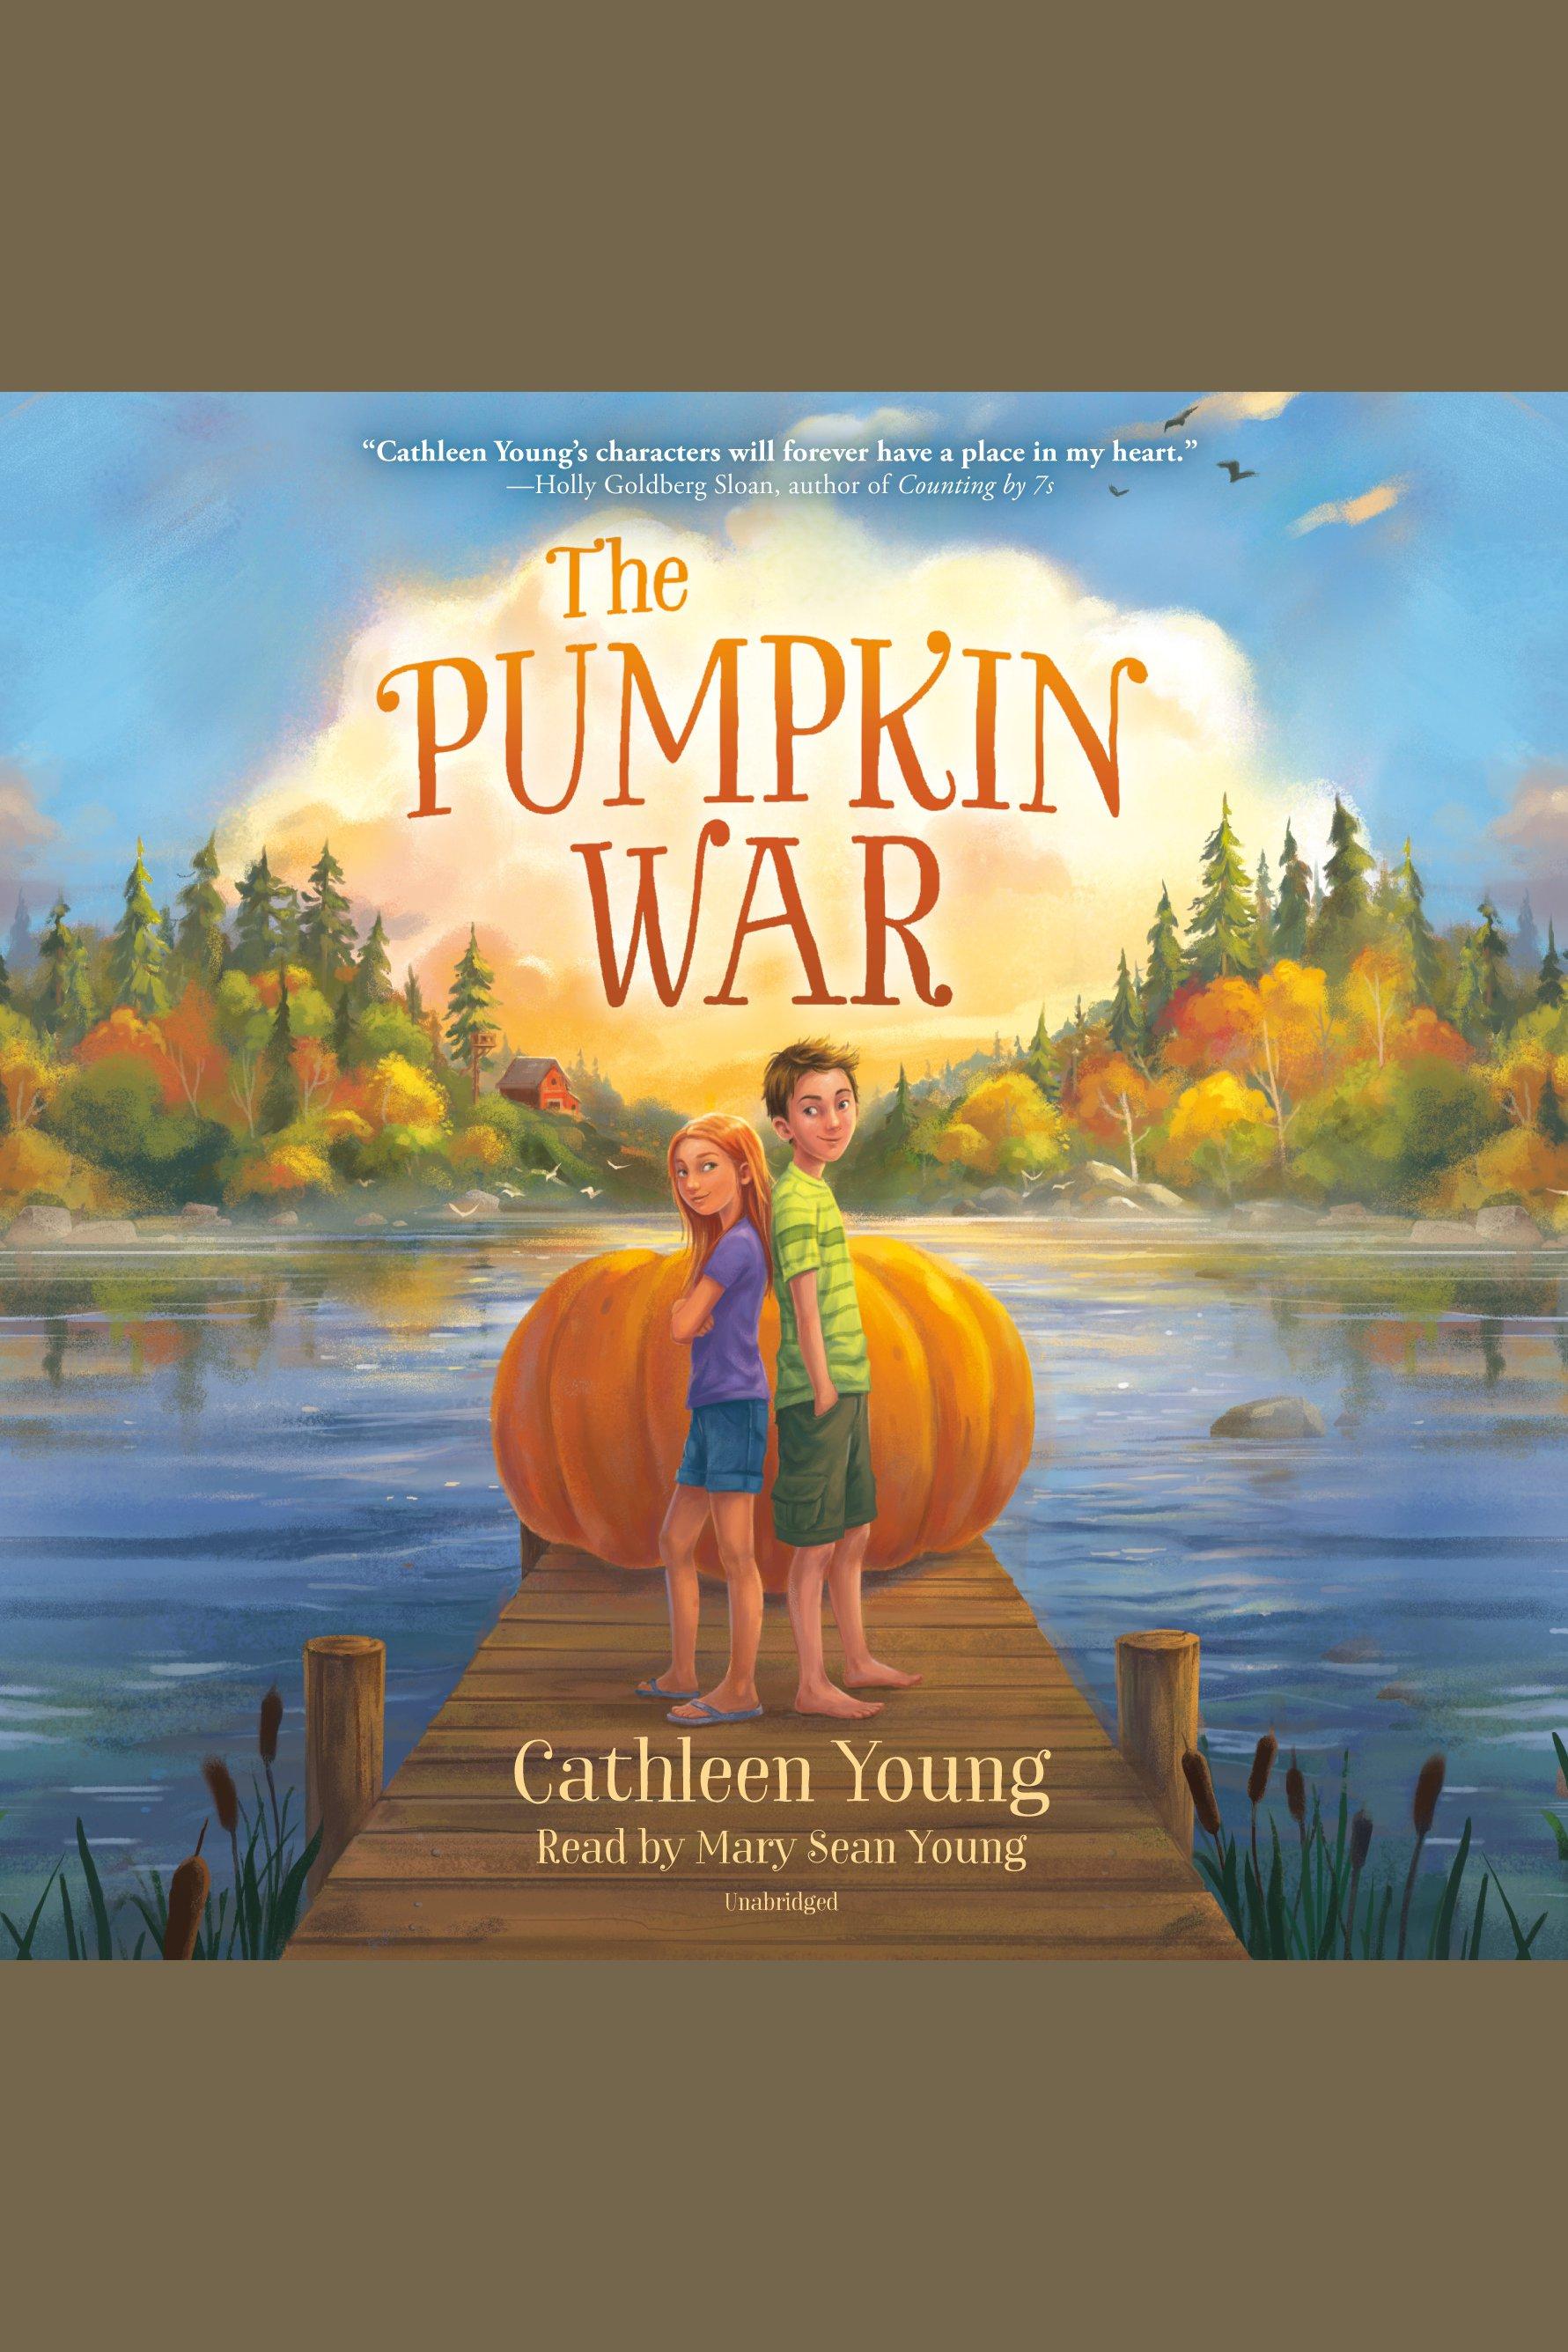 The pumpkin war cover image